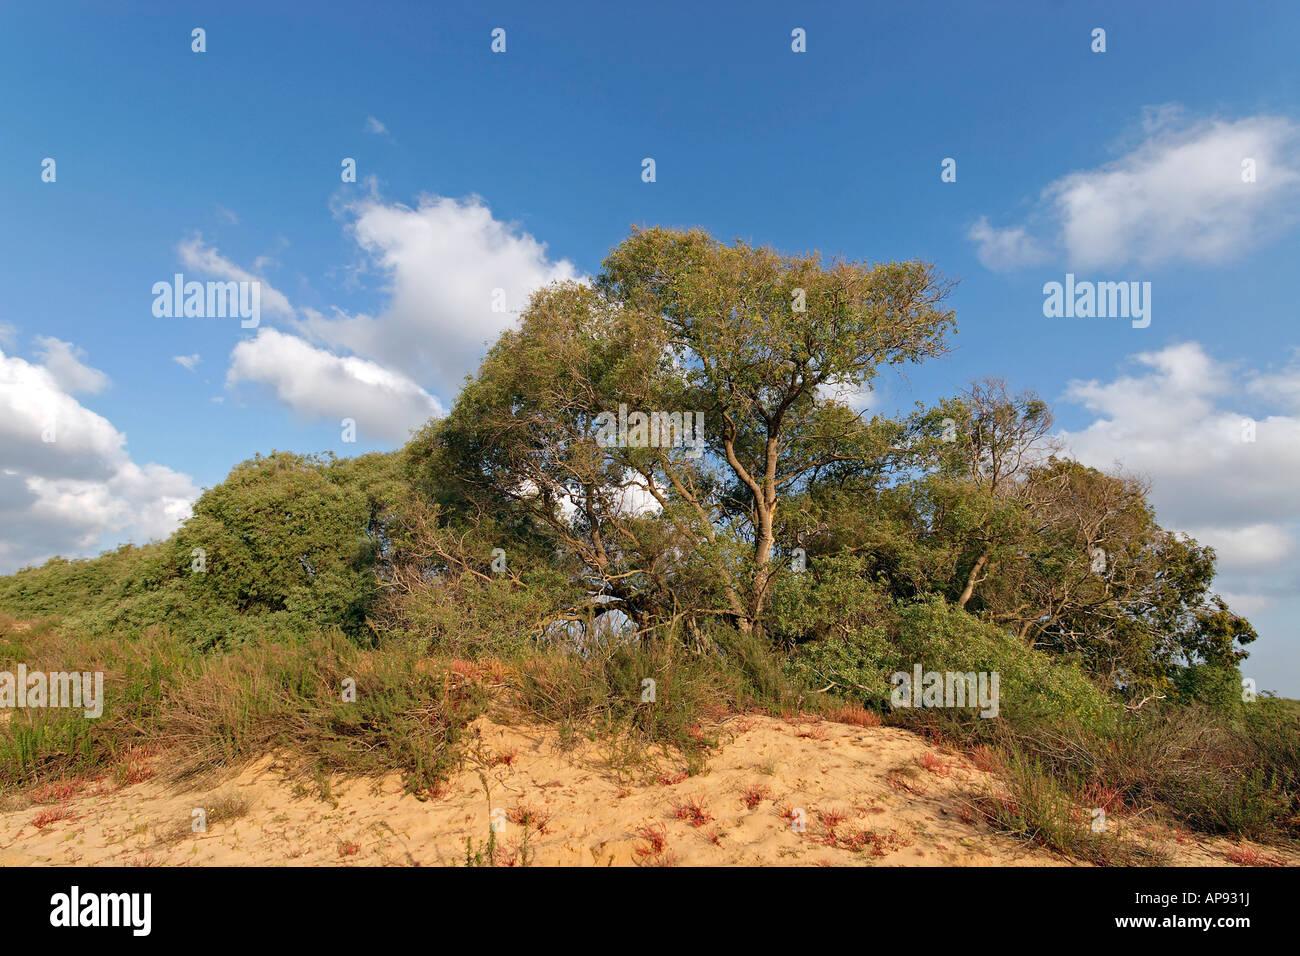 Israel Coastal Plain Euphrates Poplar trees Populus Euphratica in Nitzanim - Stock Image